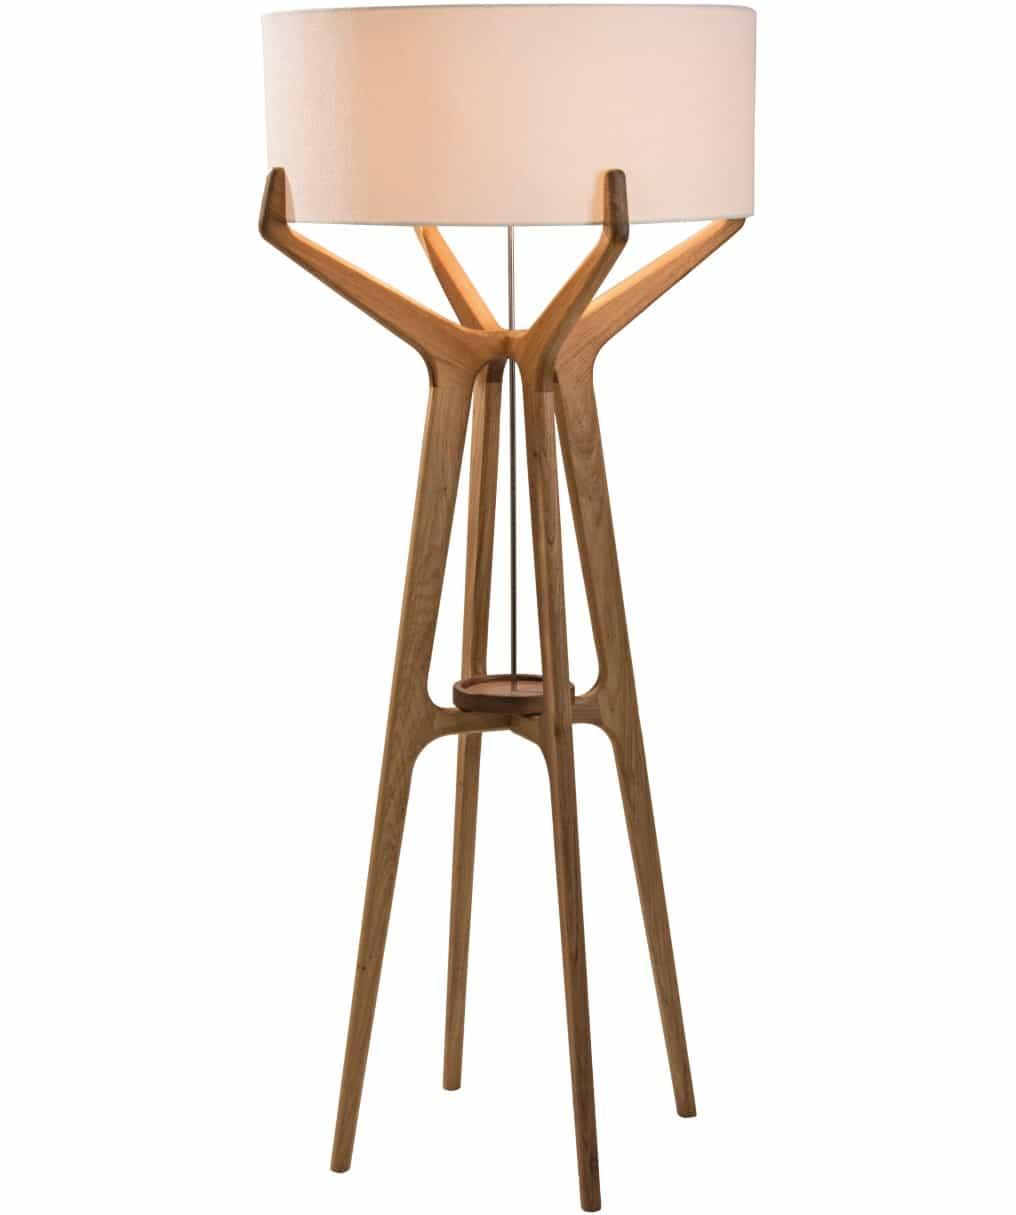 midcentury modern floor lamp